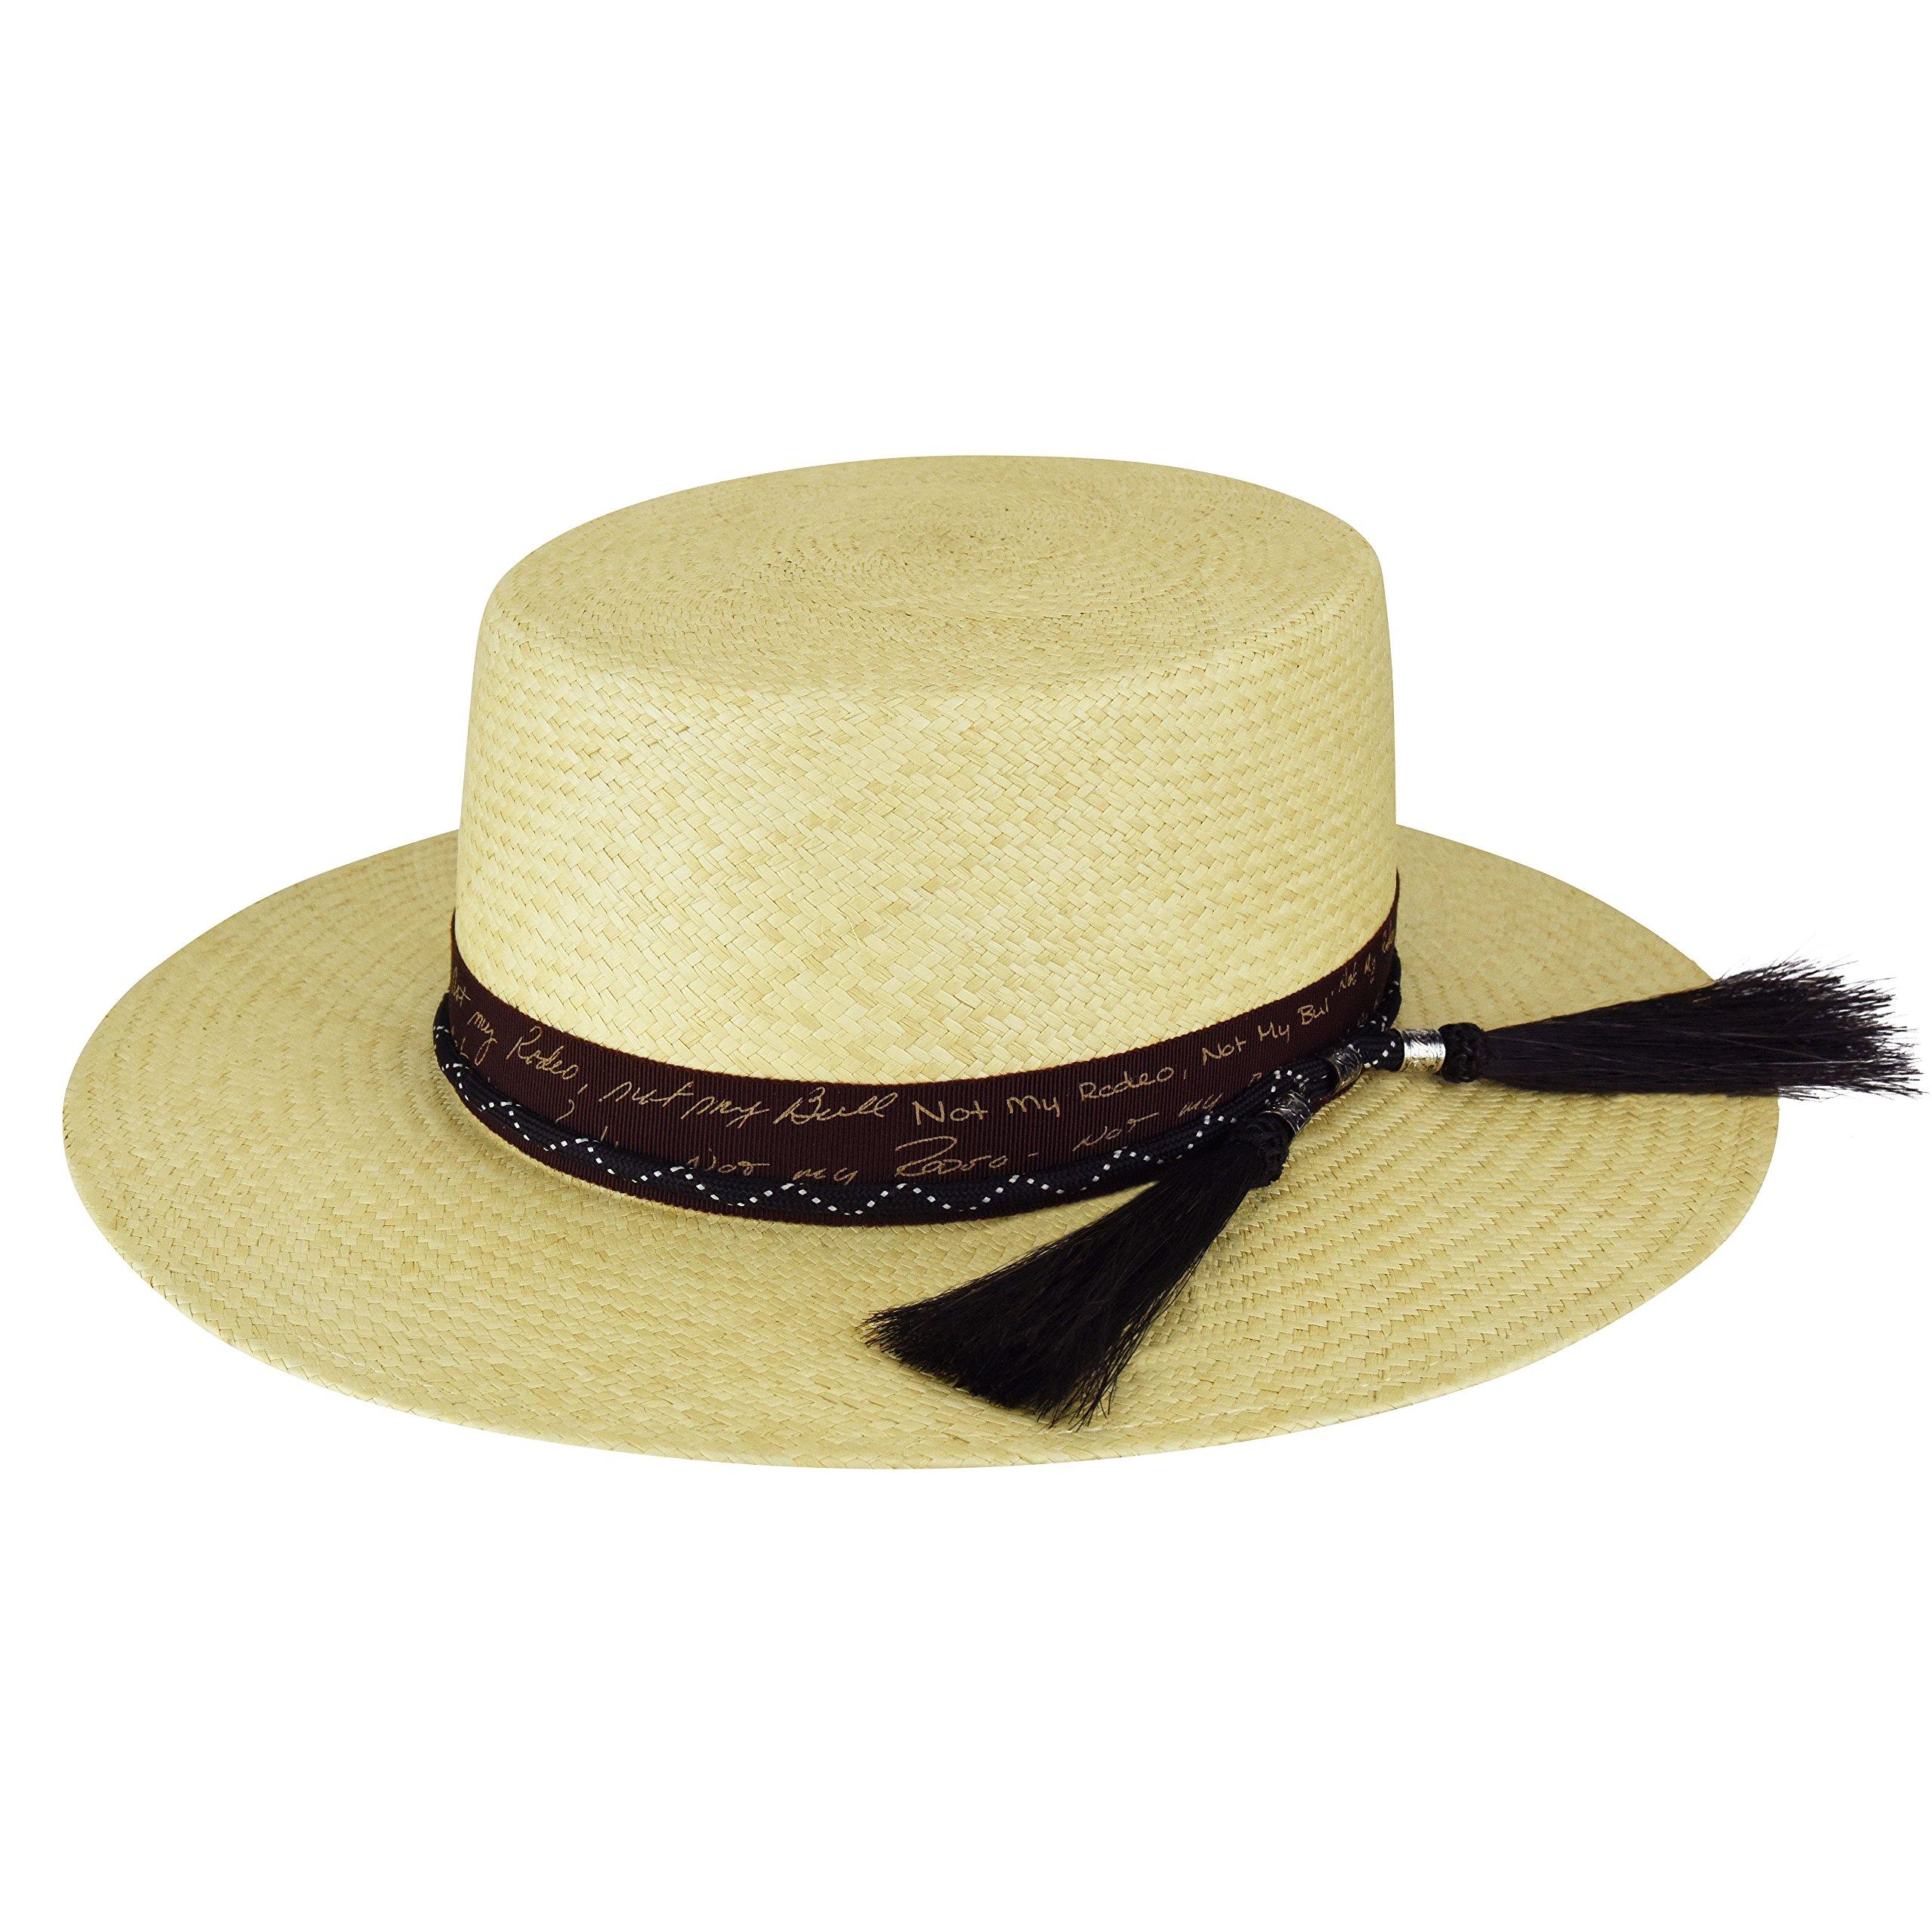 Bailey Men's Santee Bolero Crown Western Hat Natural Large